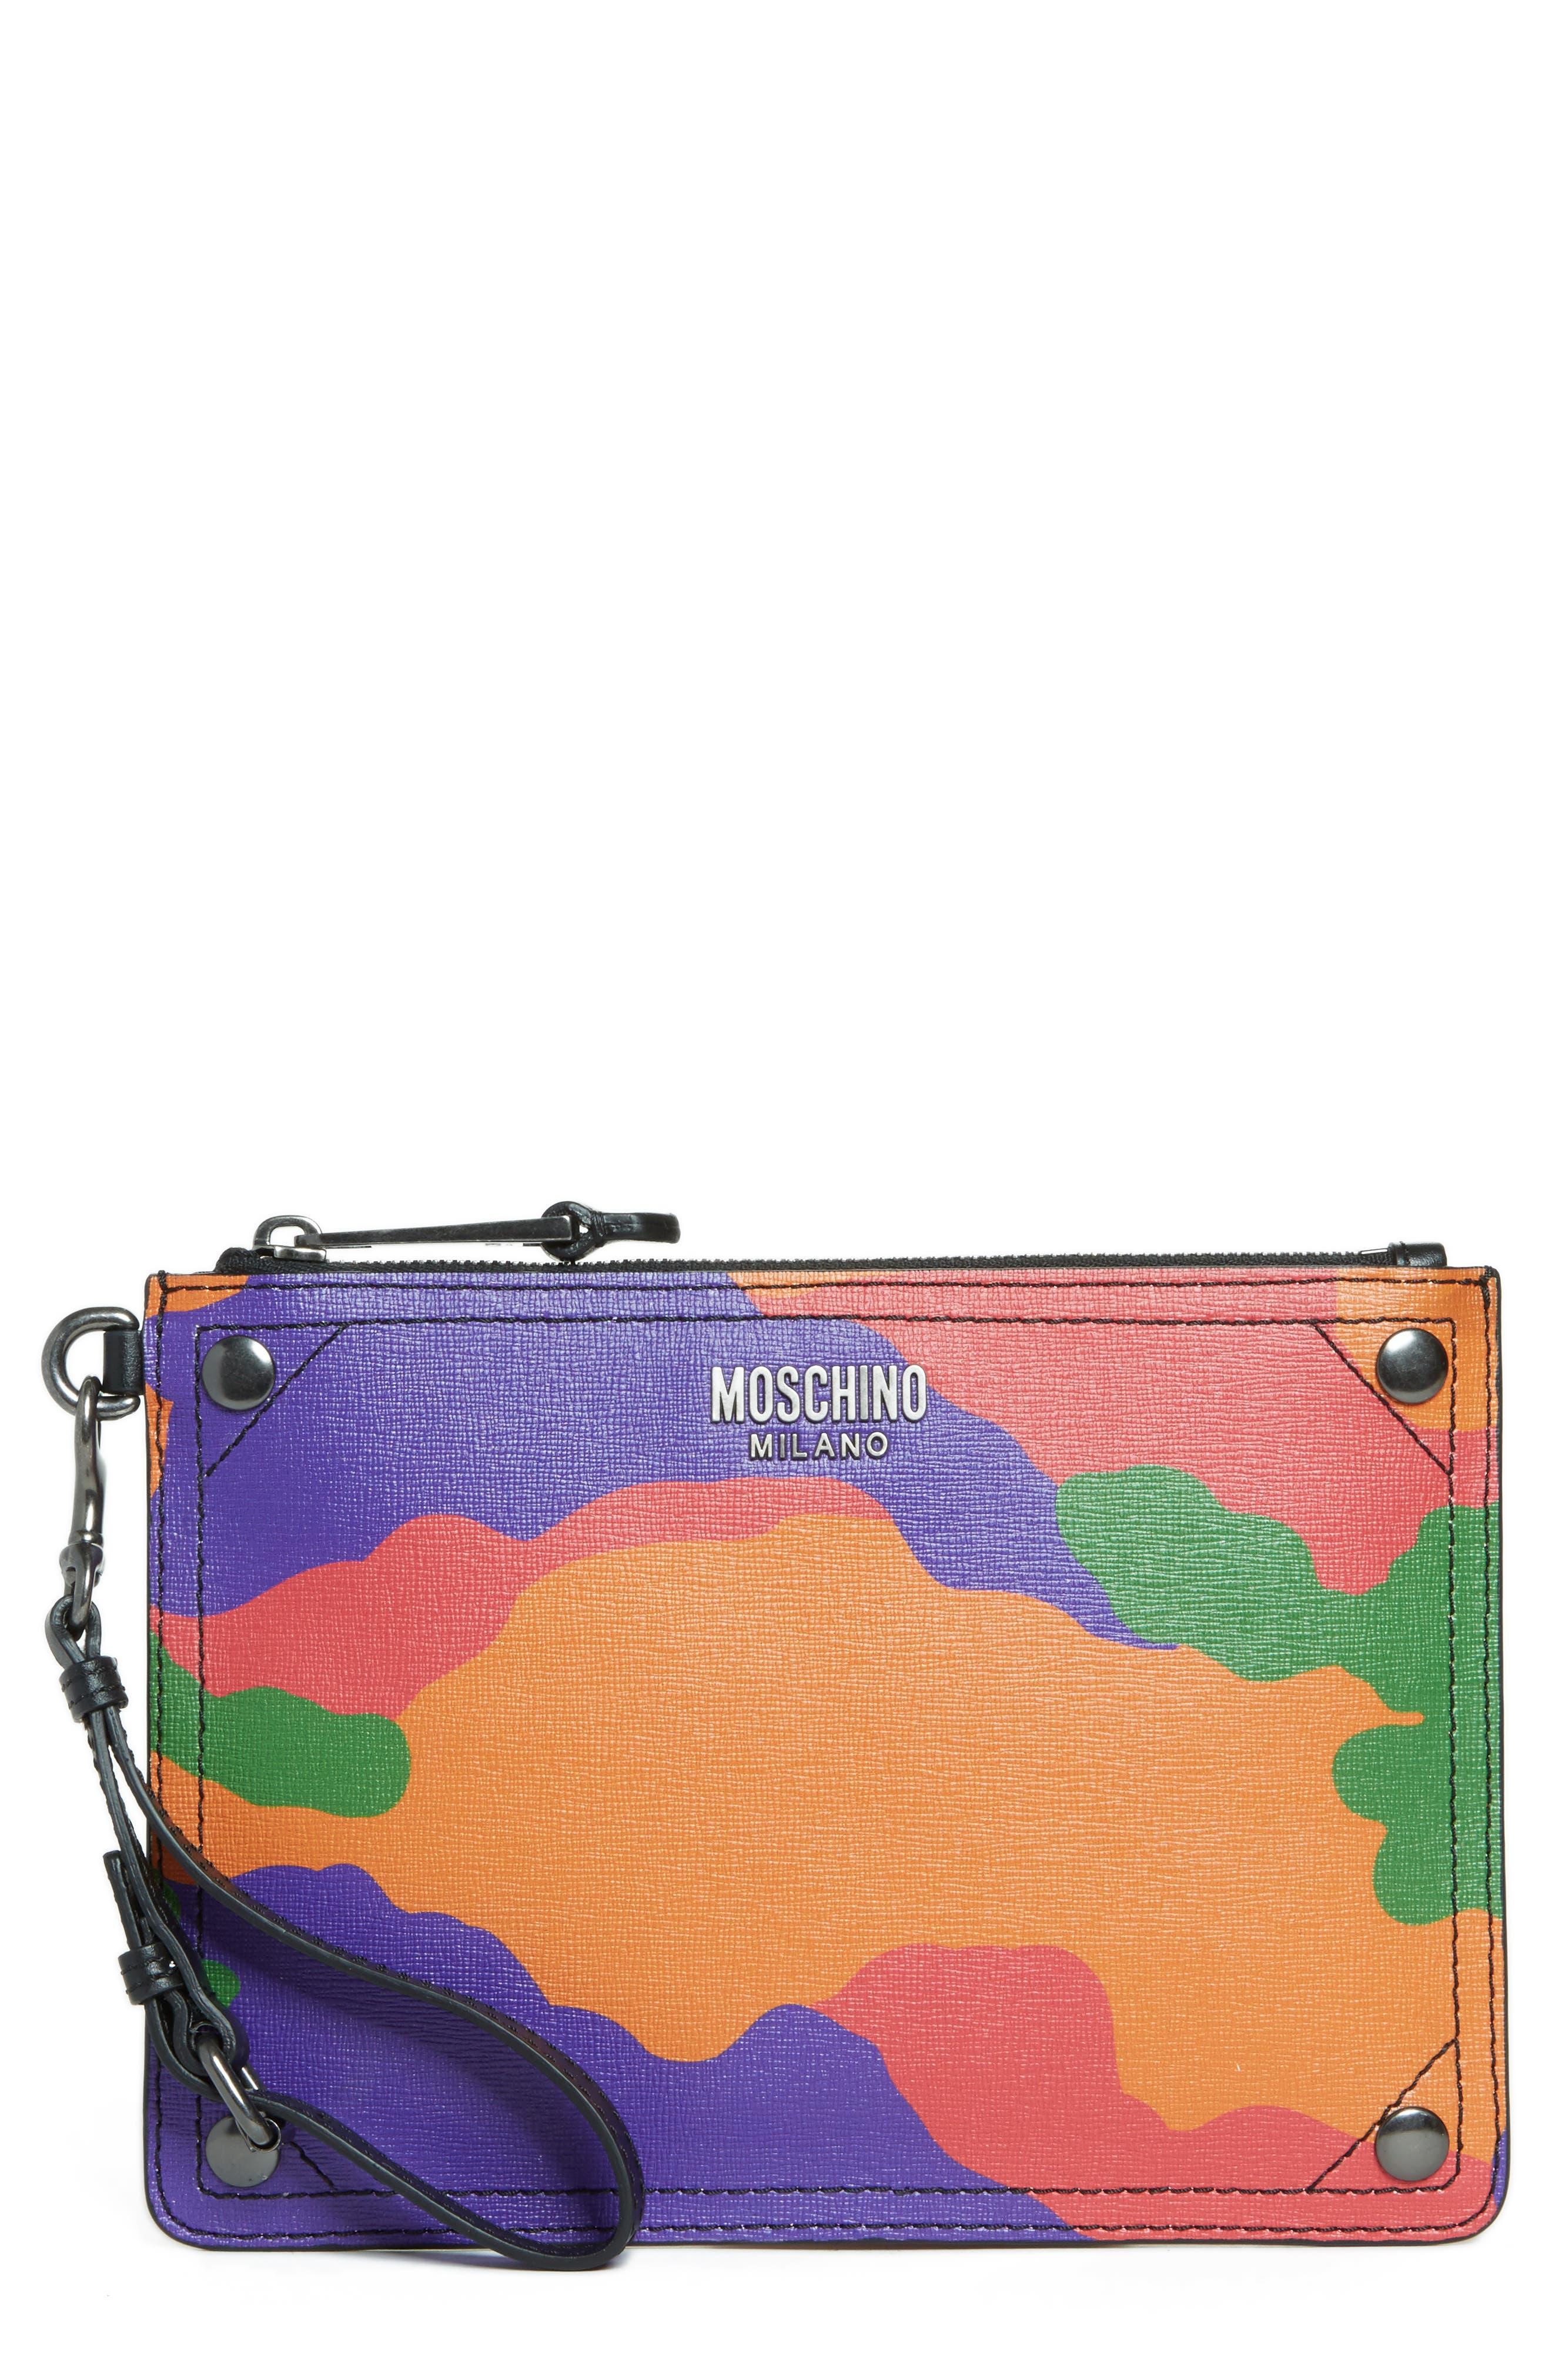 Main Image - Moschino Multi Camo Print Leather Zip Pouch Wristlet